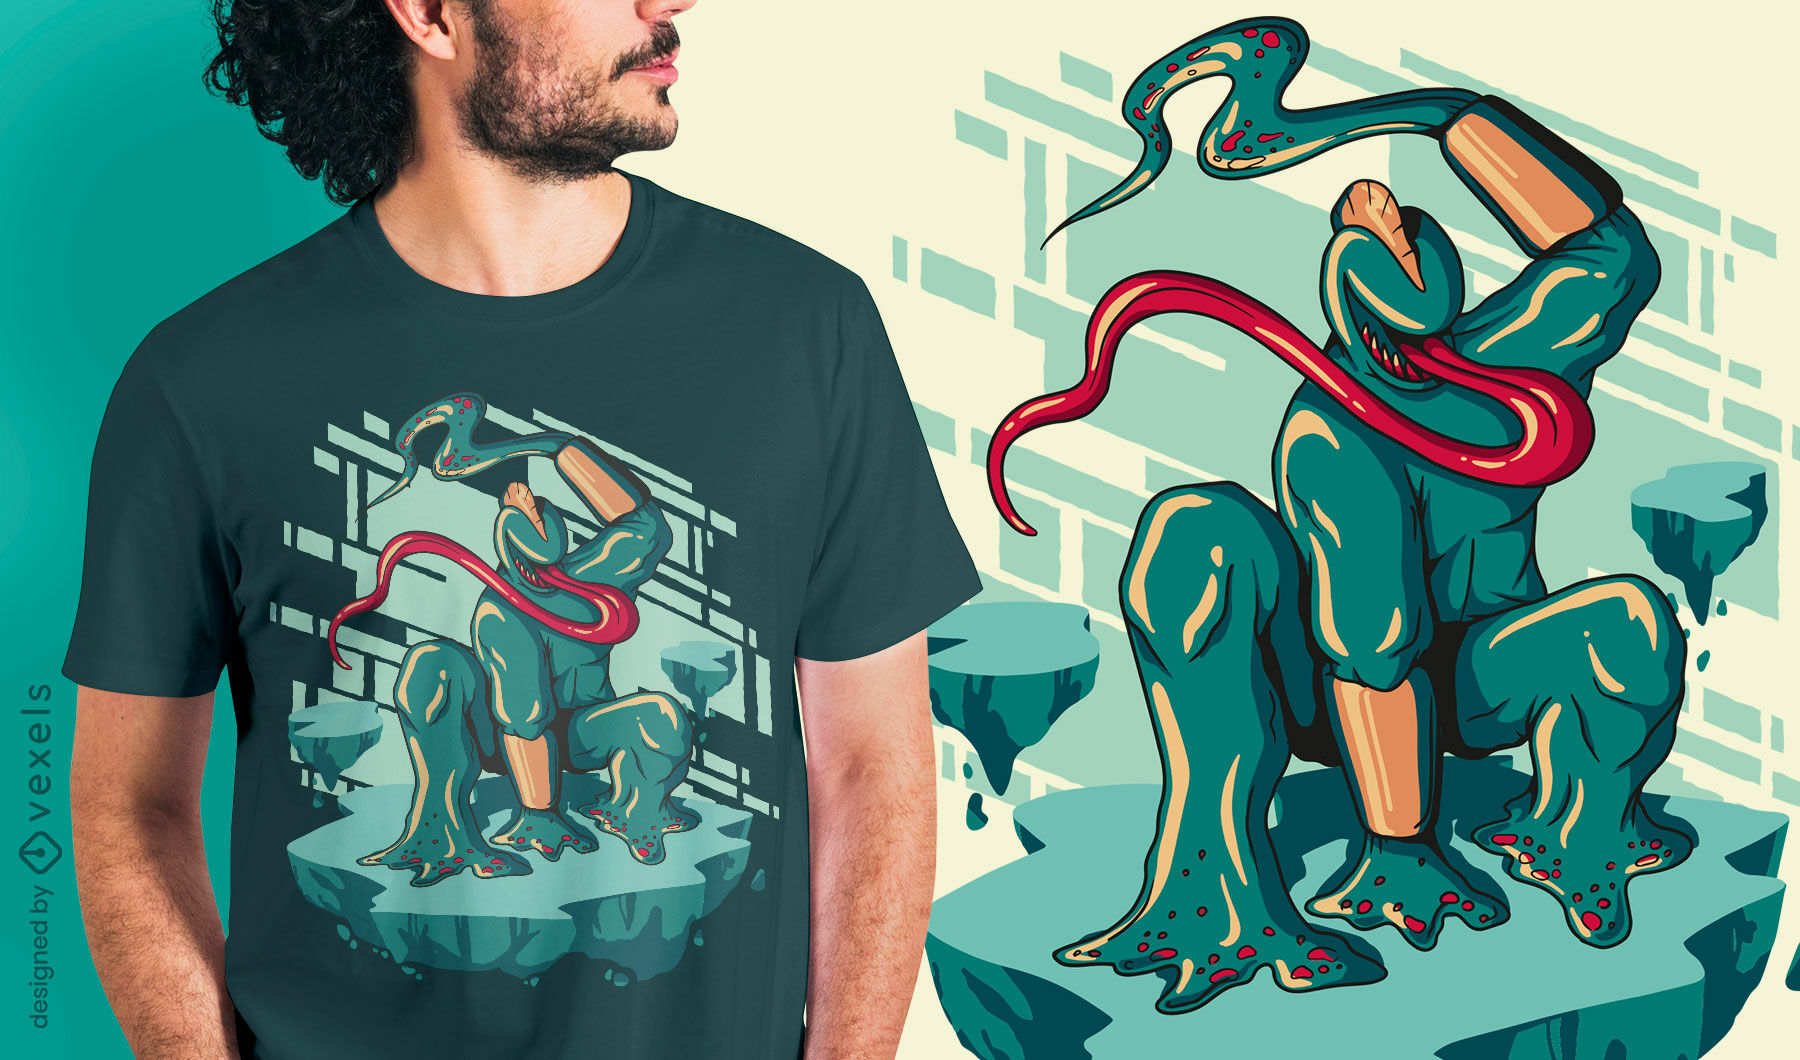 Scary nightmare monster t-shirt design